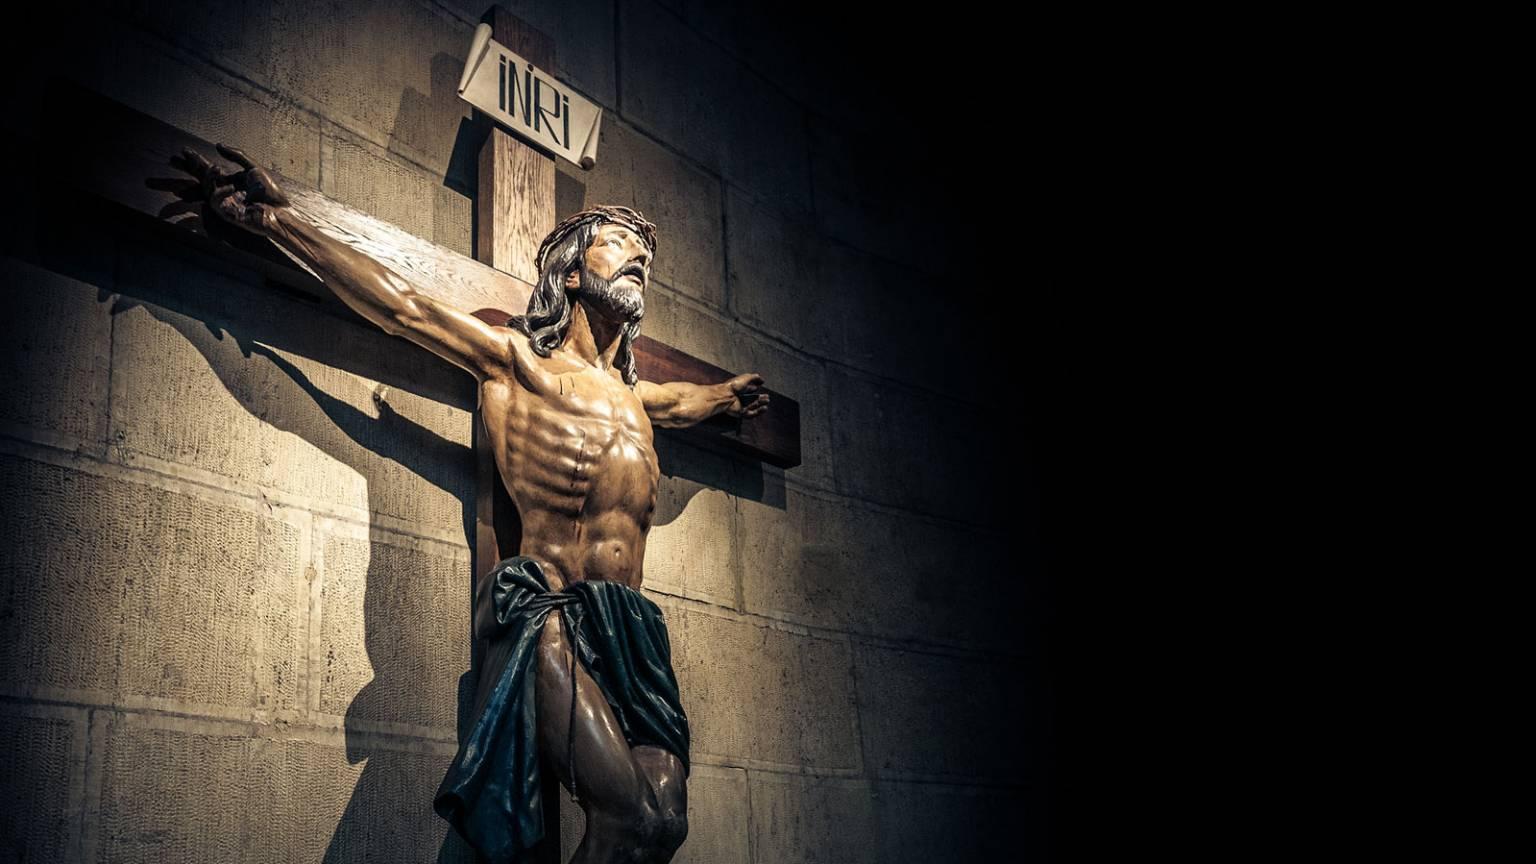 formacao_1600x1200-o-acolhimento-de-jesus-nos-cura-1536x864.jpg